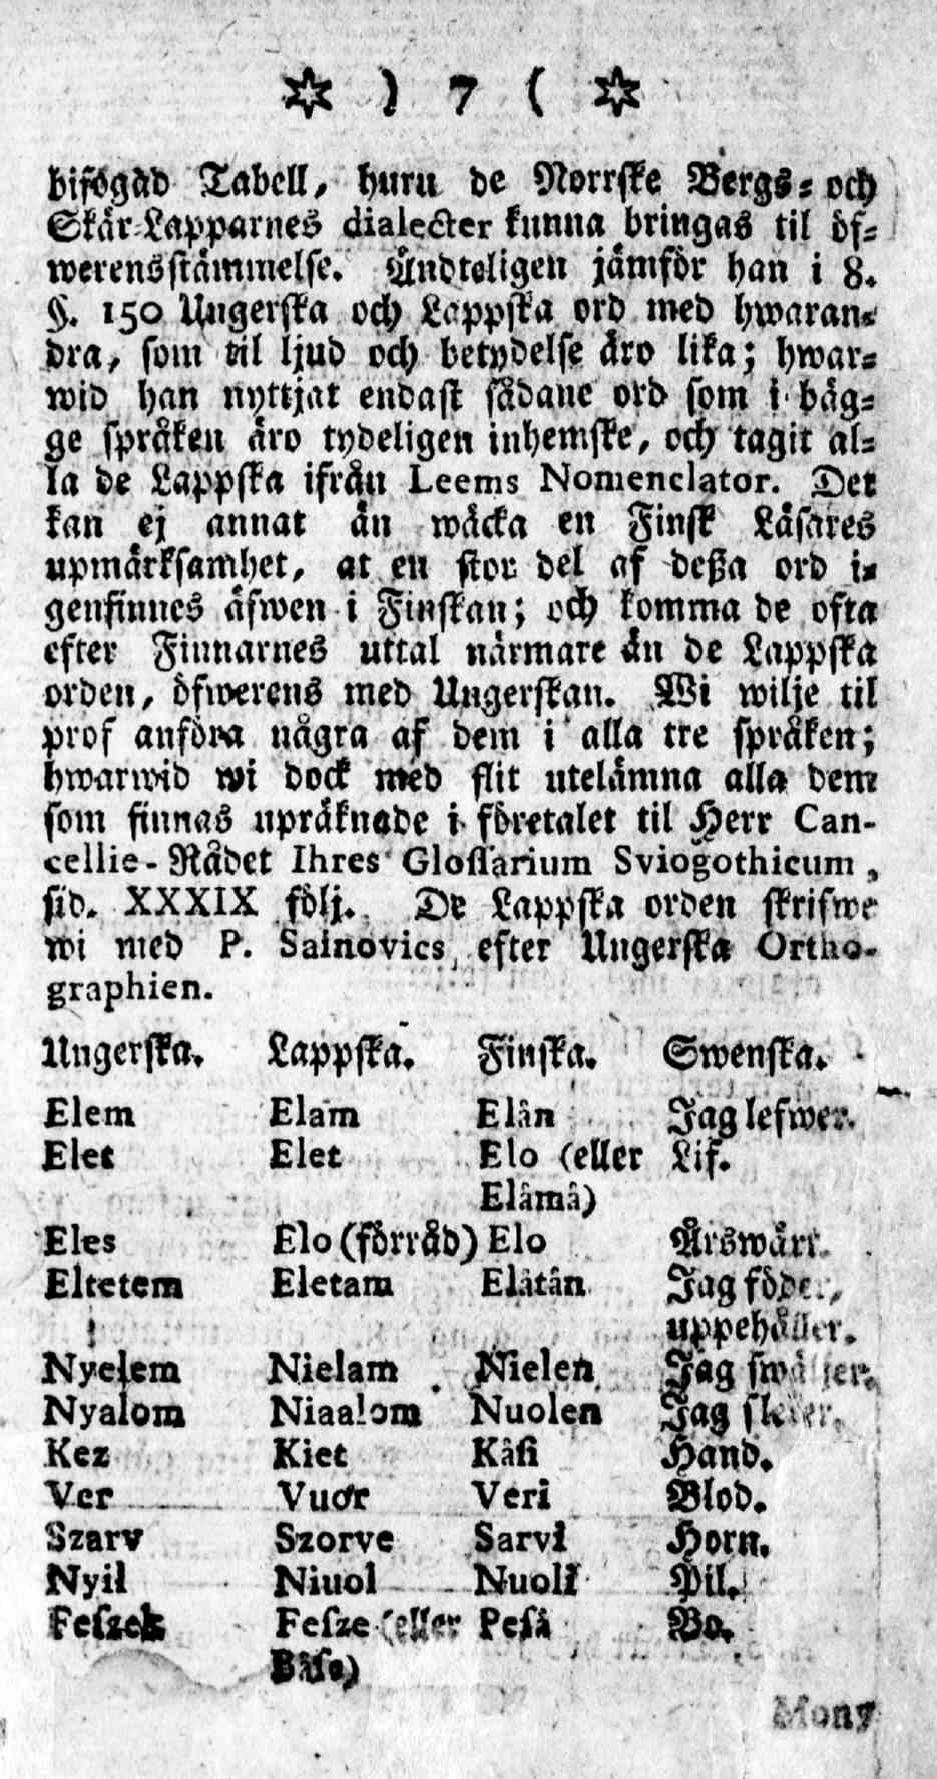 Tidningar Utgifne af et Sällskap i Åbo, 15.01.1771, nro 1, sivu 7